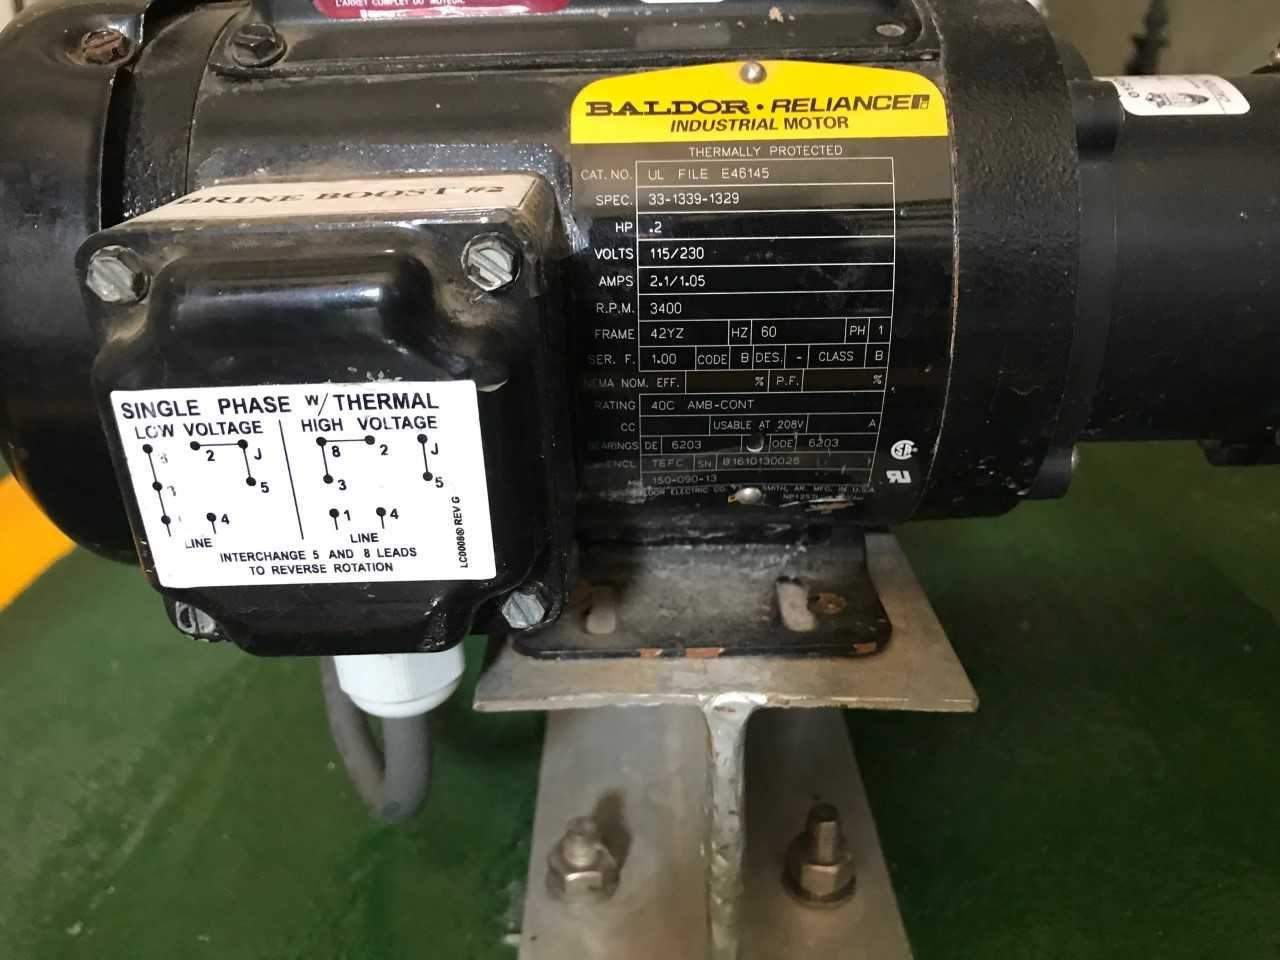 Baldor Reliance Brine Booster Pump 33 1339 1329 Electric Motor Drip Coffee Maker High Voltage